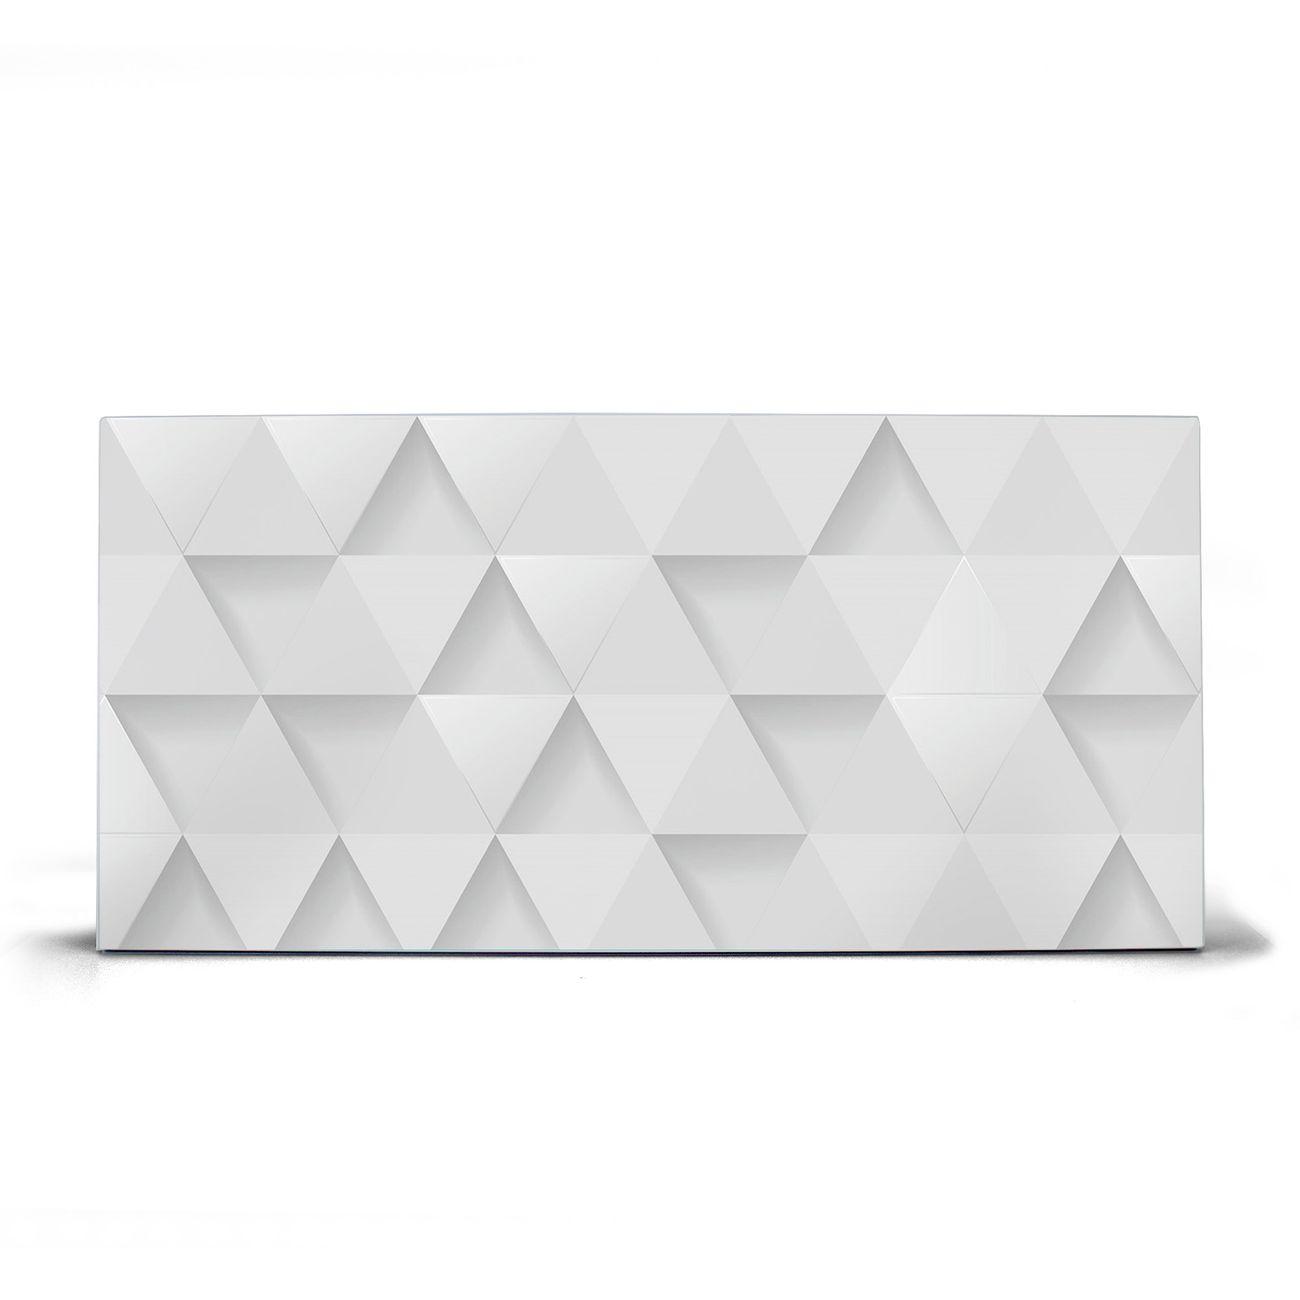 Magnettafel silber Querformat Weisse Dreiecke